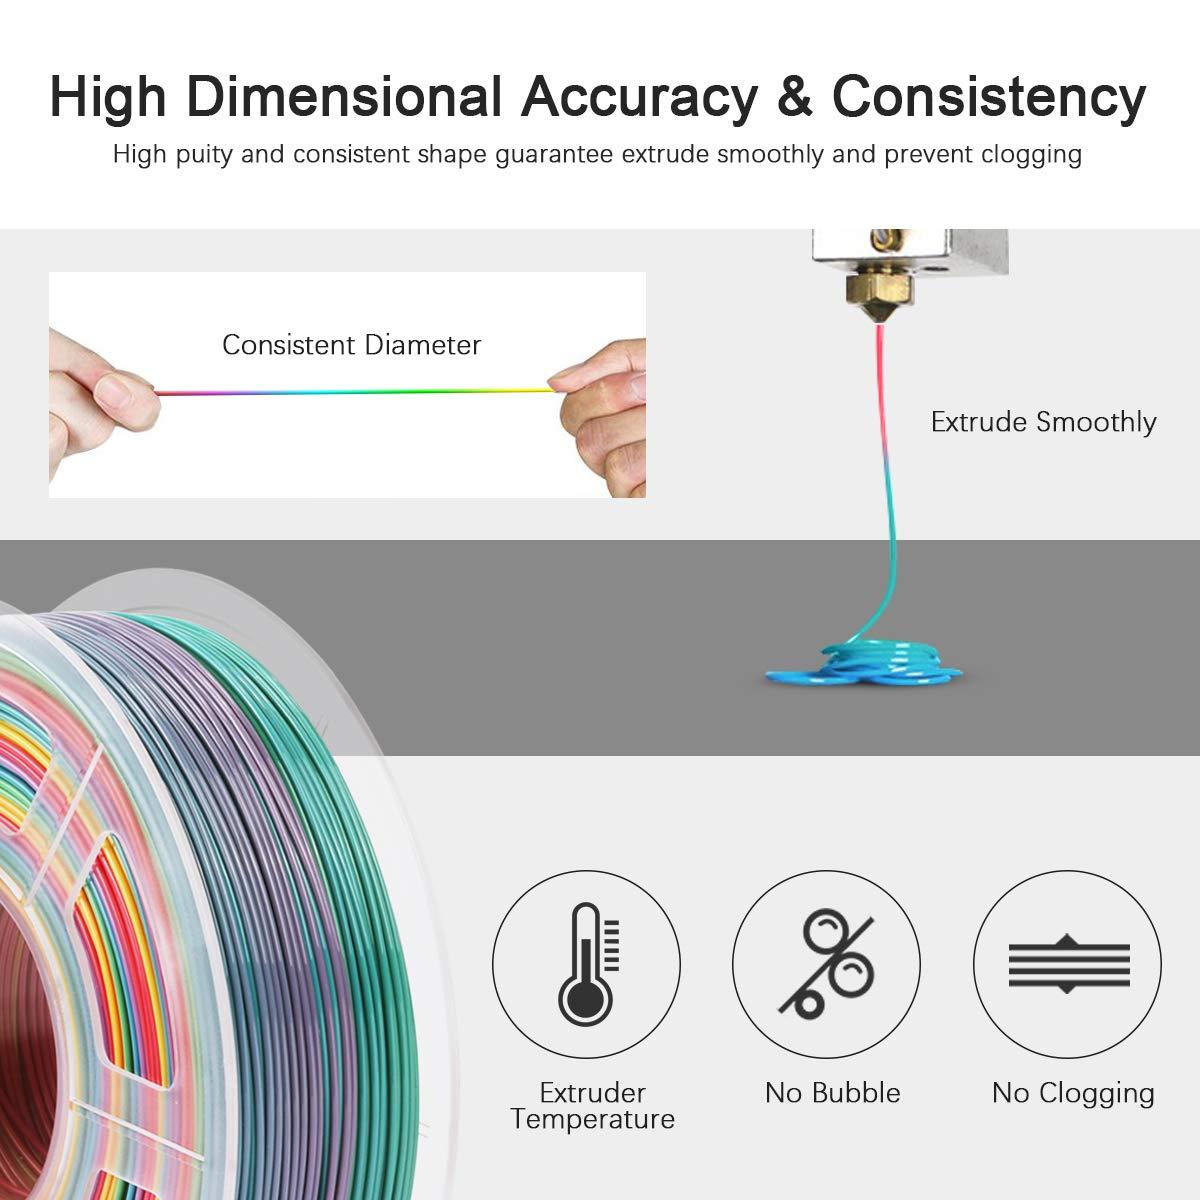 PLA Filament Regenbogen 1.75mm, 3D Warhorse PLA Filament for 3D Printer,Dimensional Accuracy +//- 0.02 mm,2 KG(Spool ,PLA Regenbogen+Schwarz